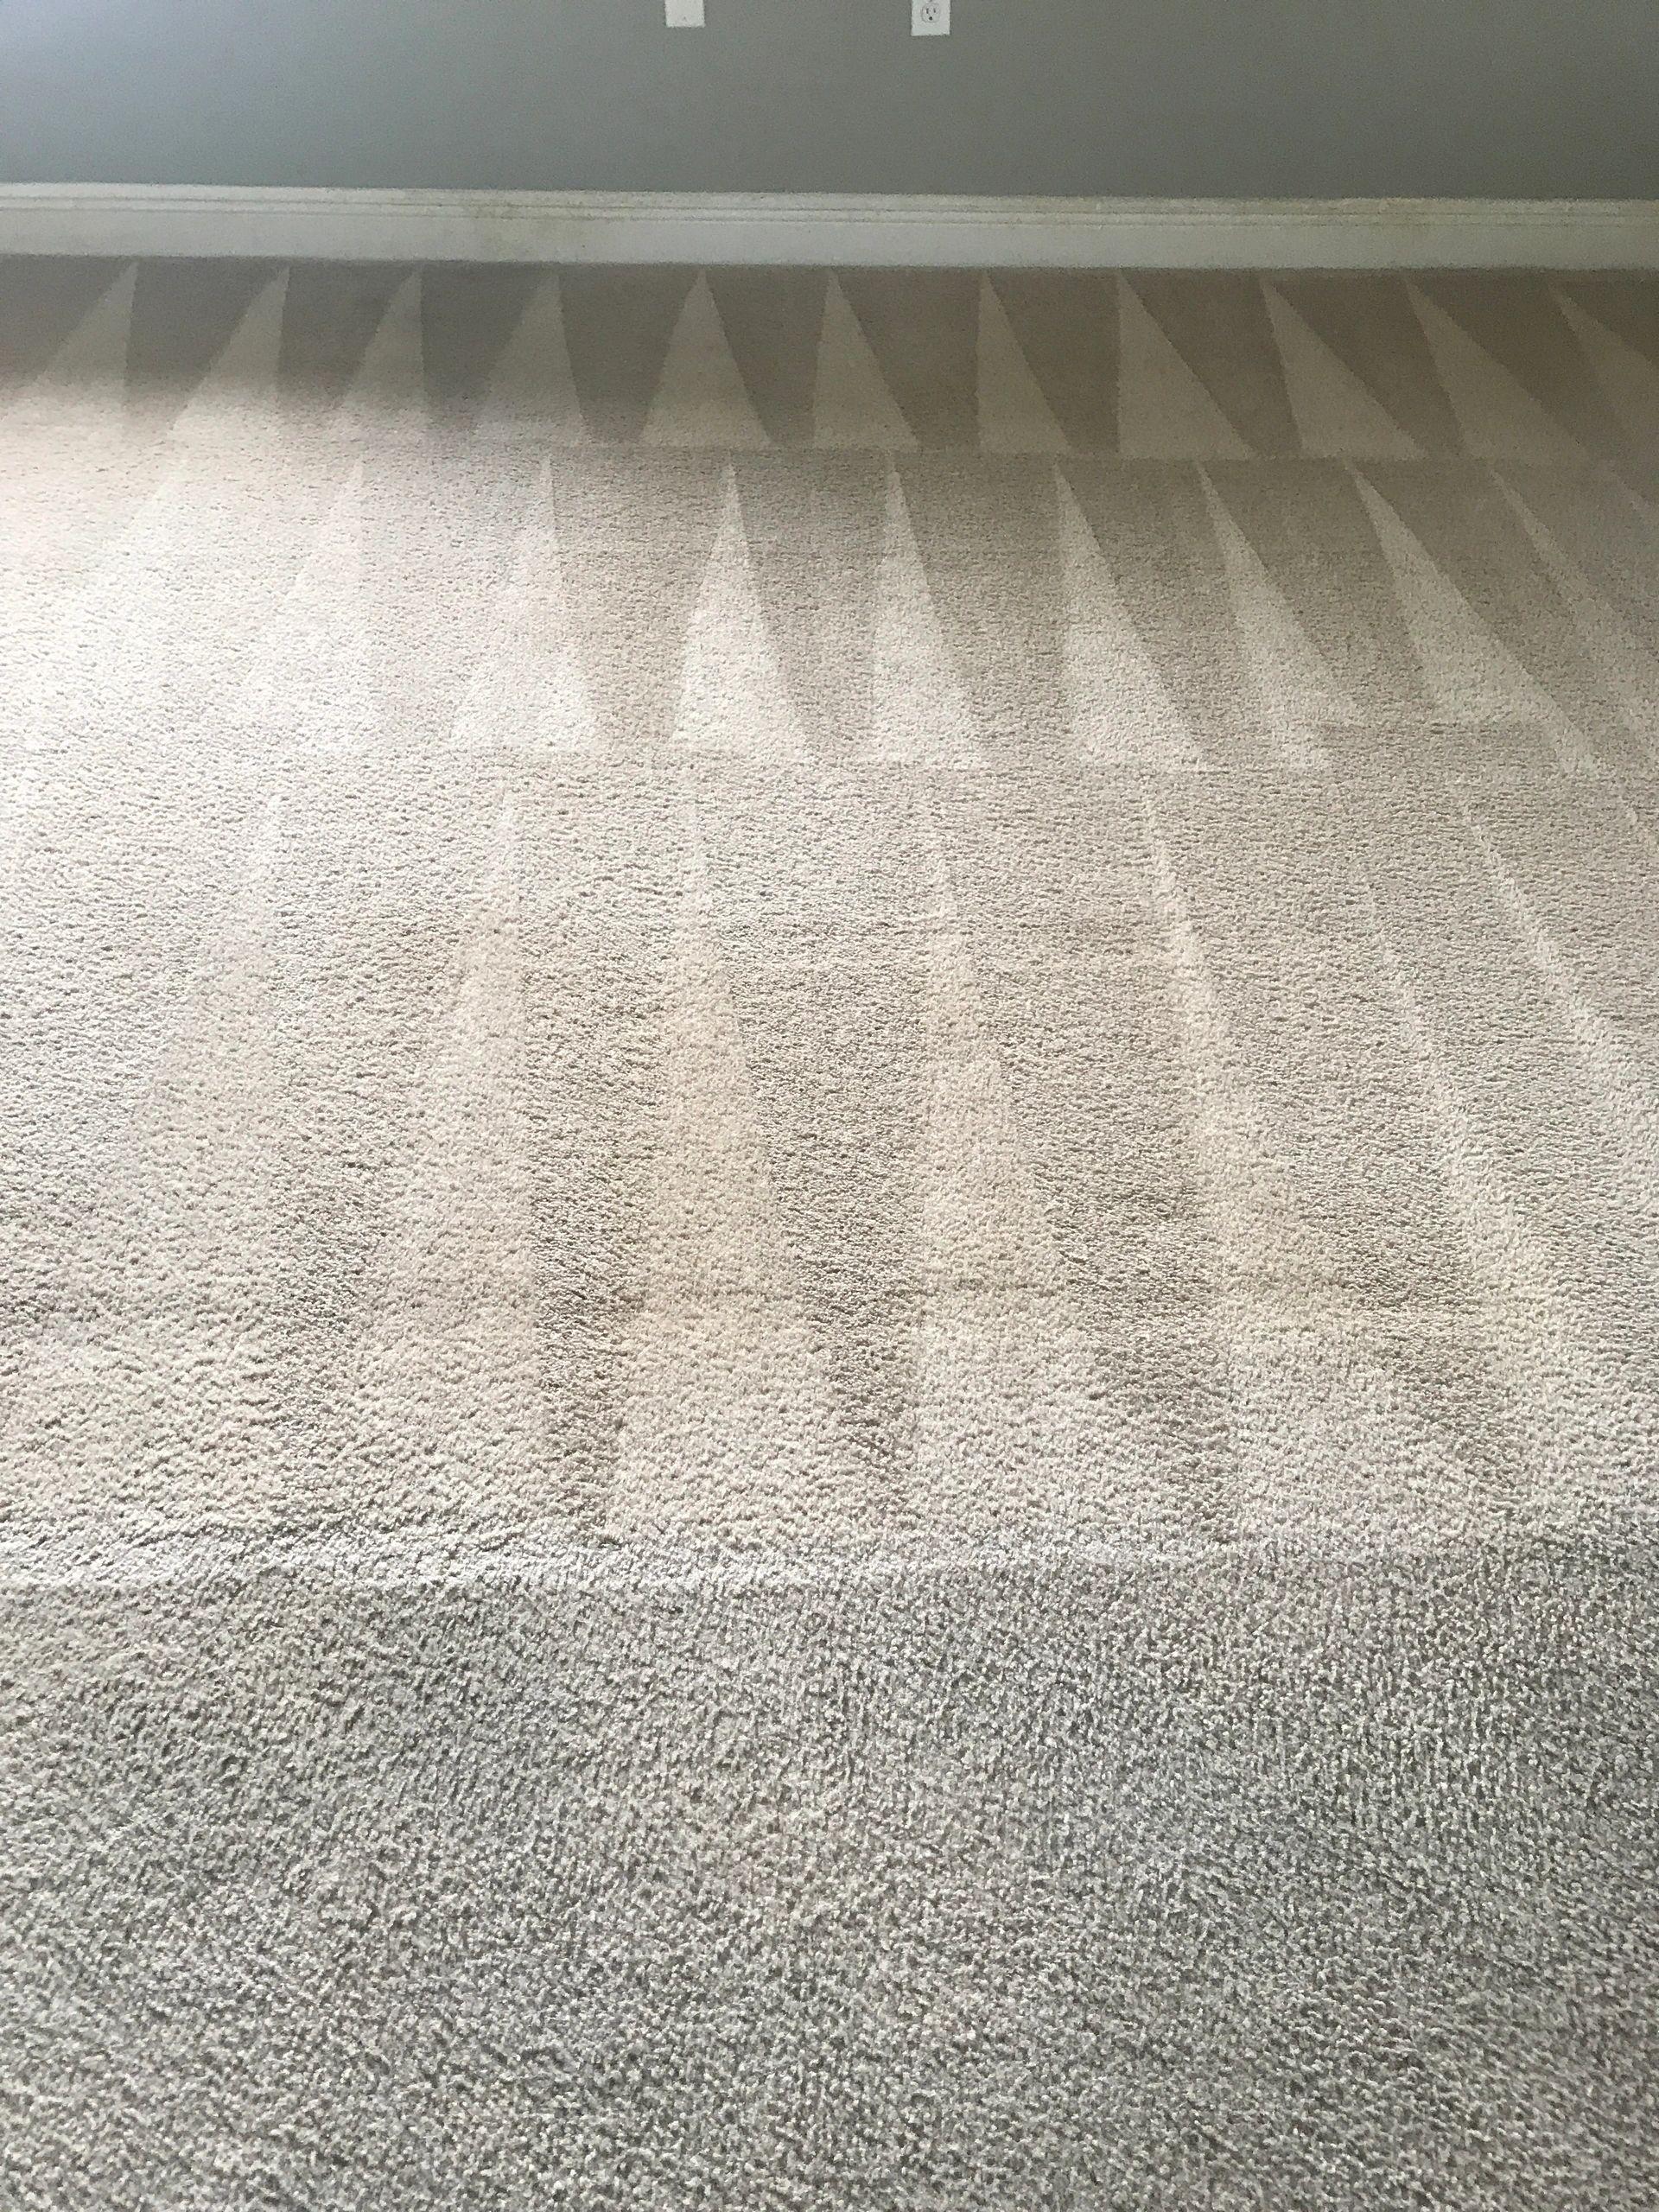 Carpet Steam Cleaning Kissimmee Carpet Vidalondon